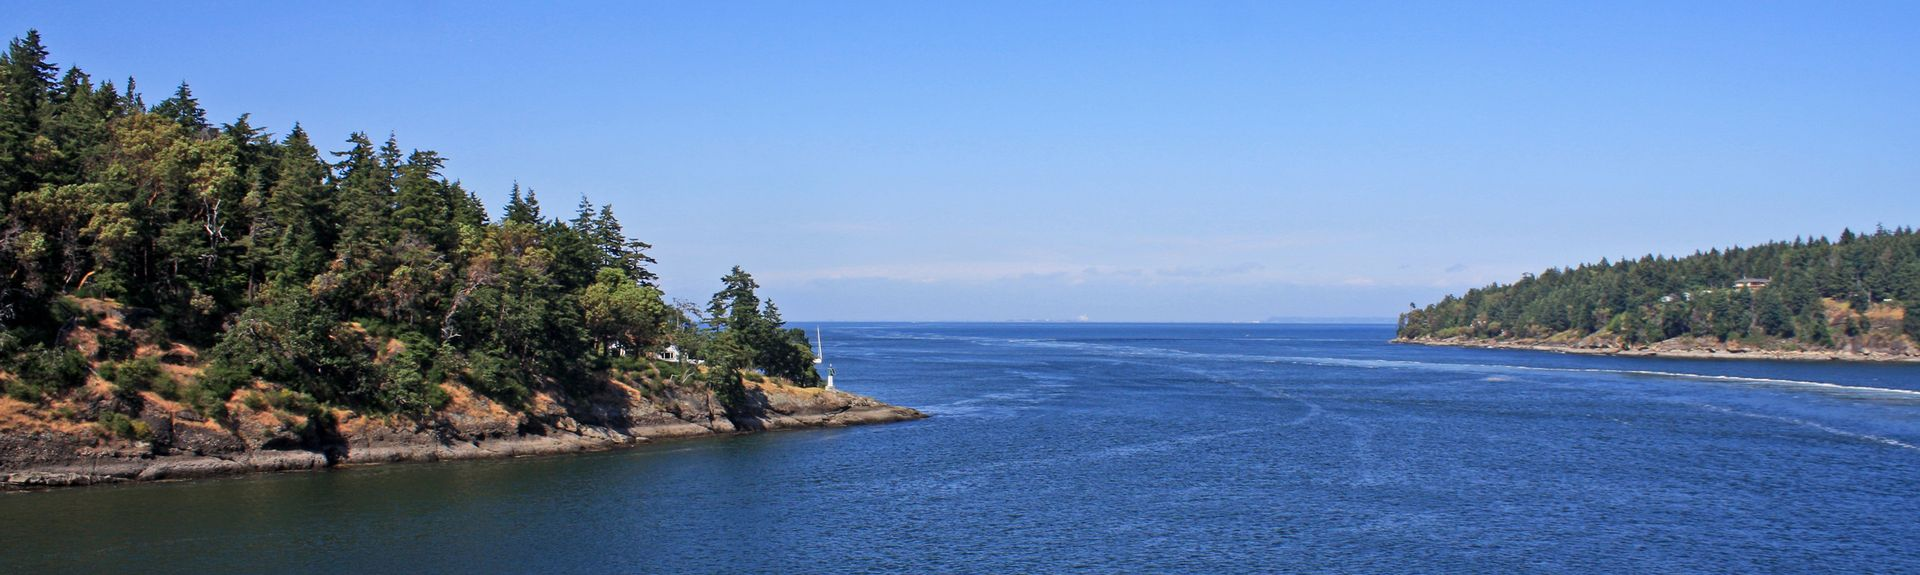 Gulf Islands, British Columbia, Canadá